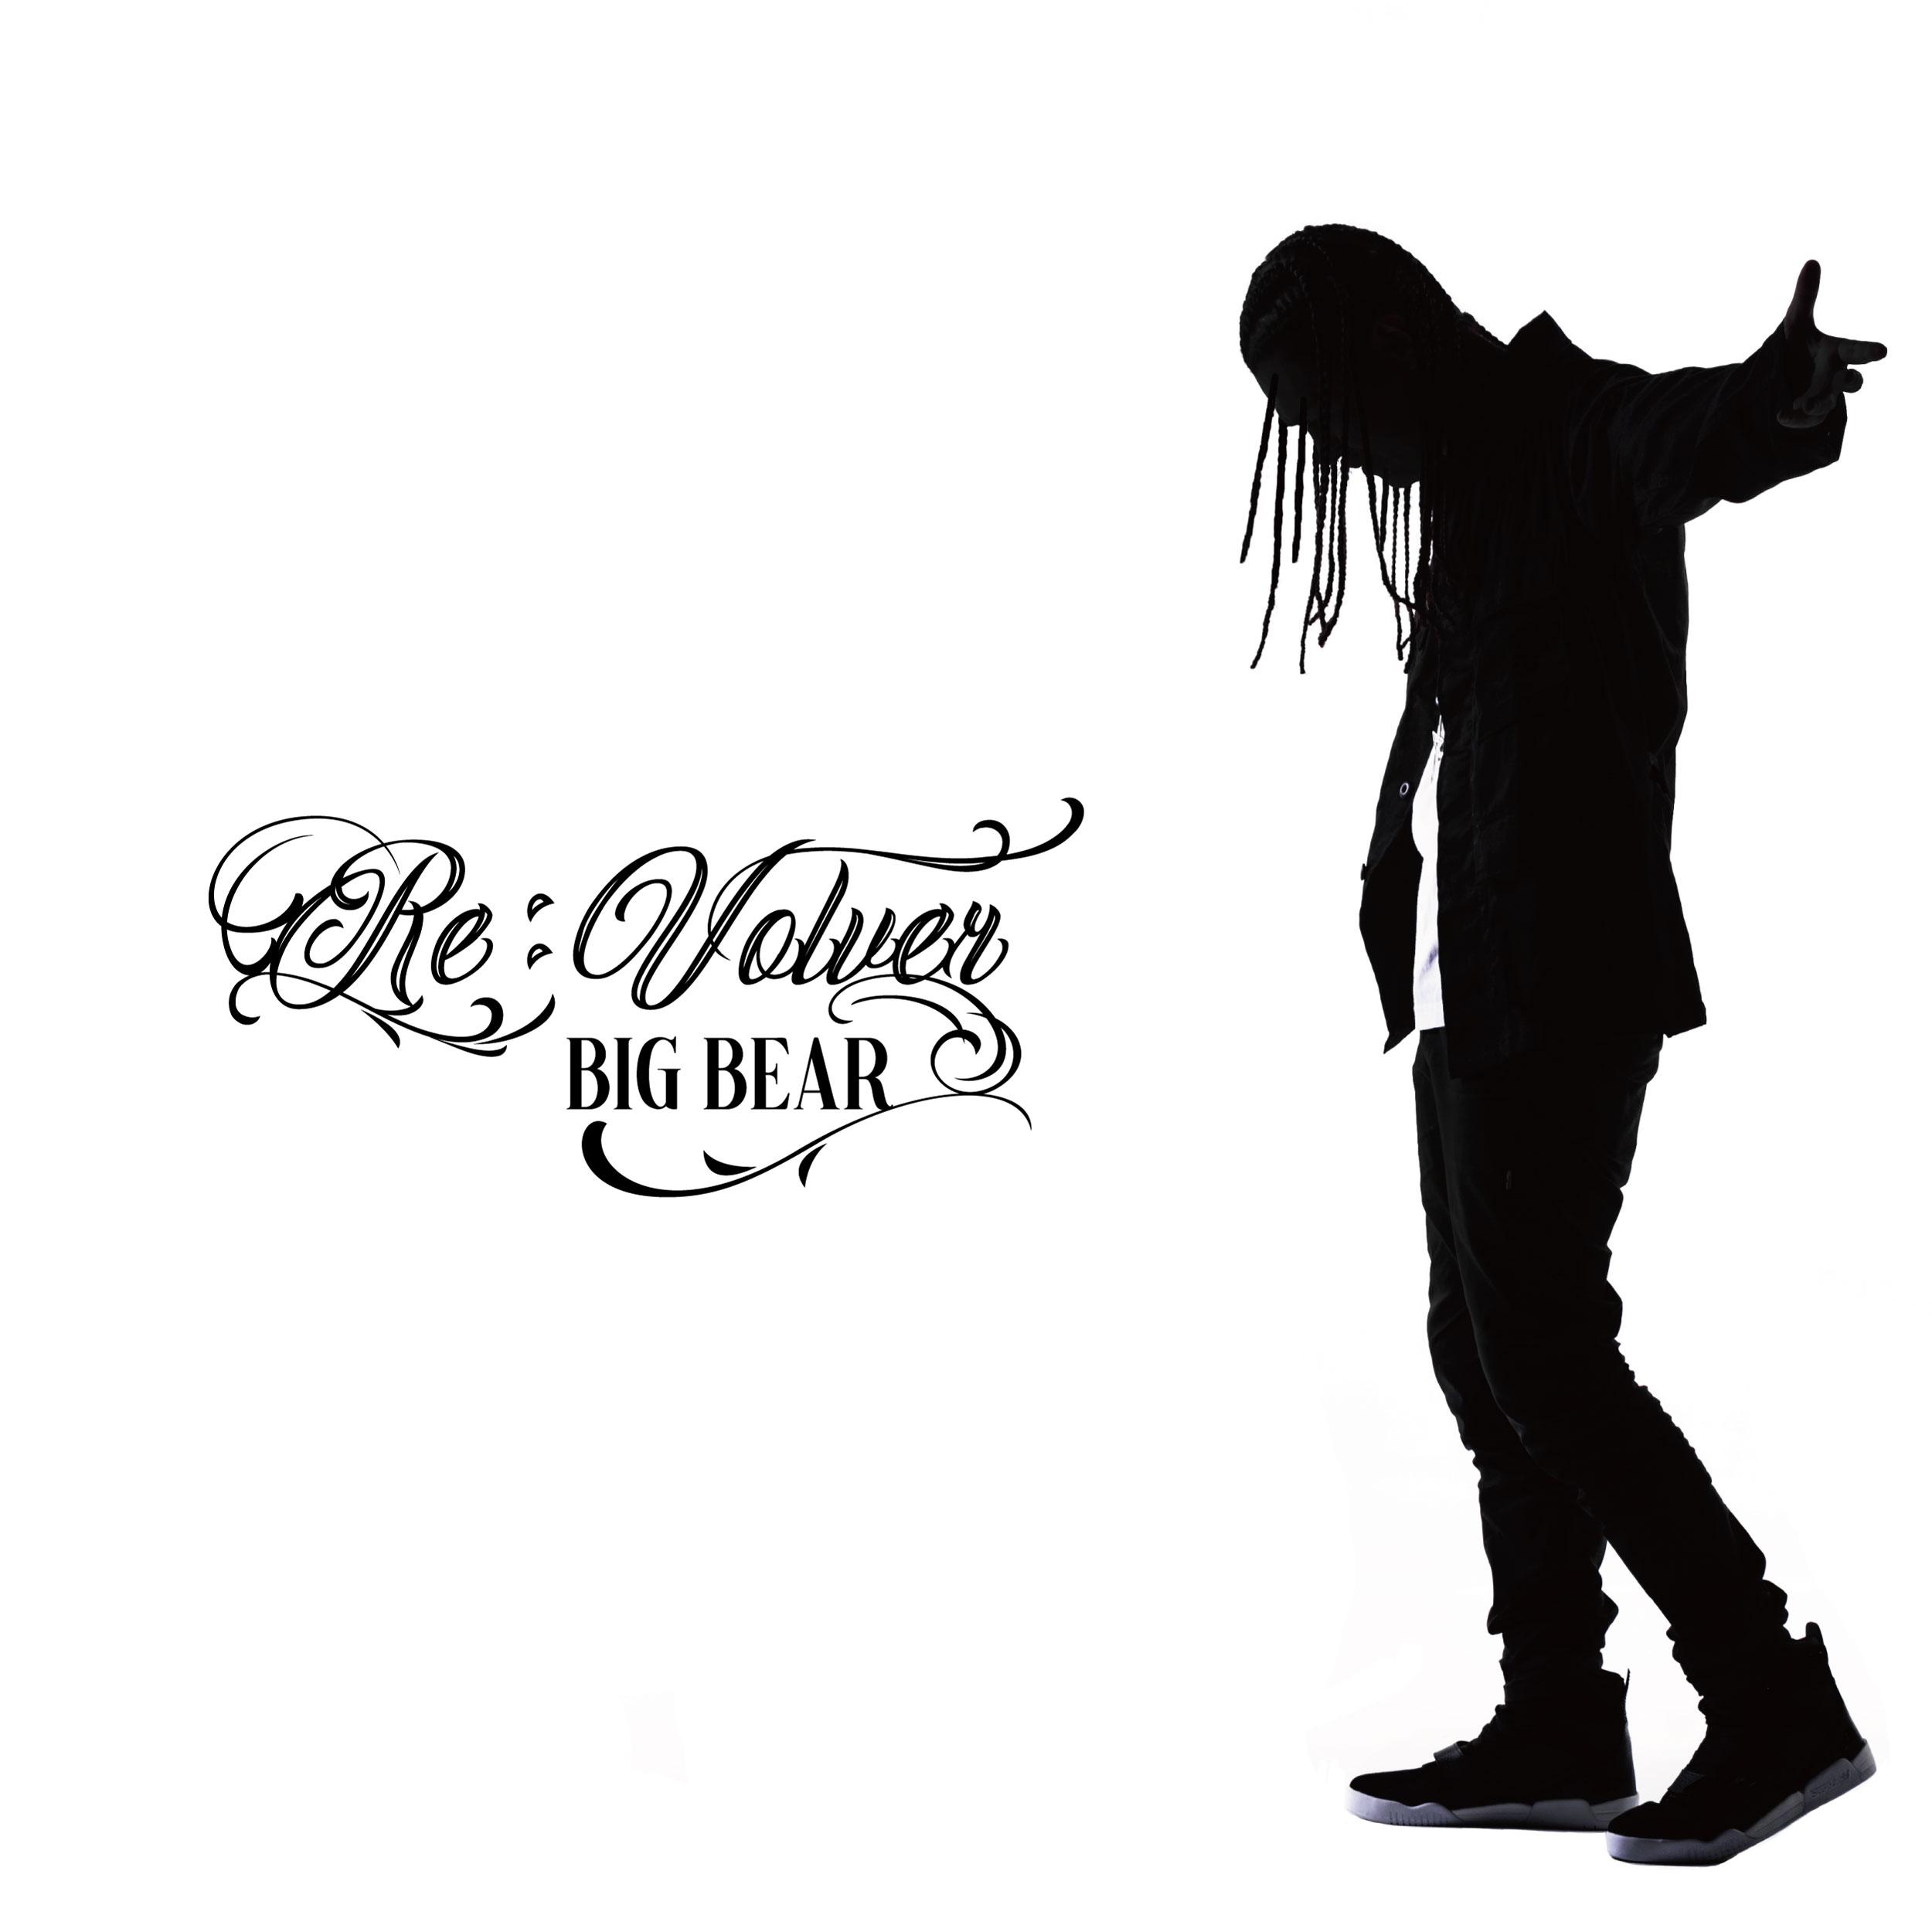 BIG BEAR【Re:Volver】-EP-